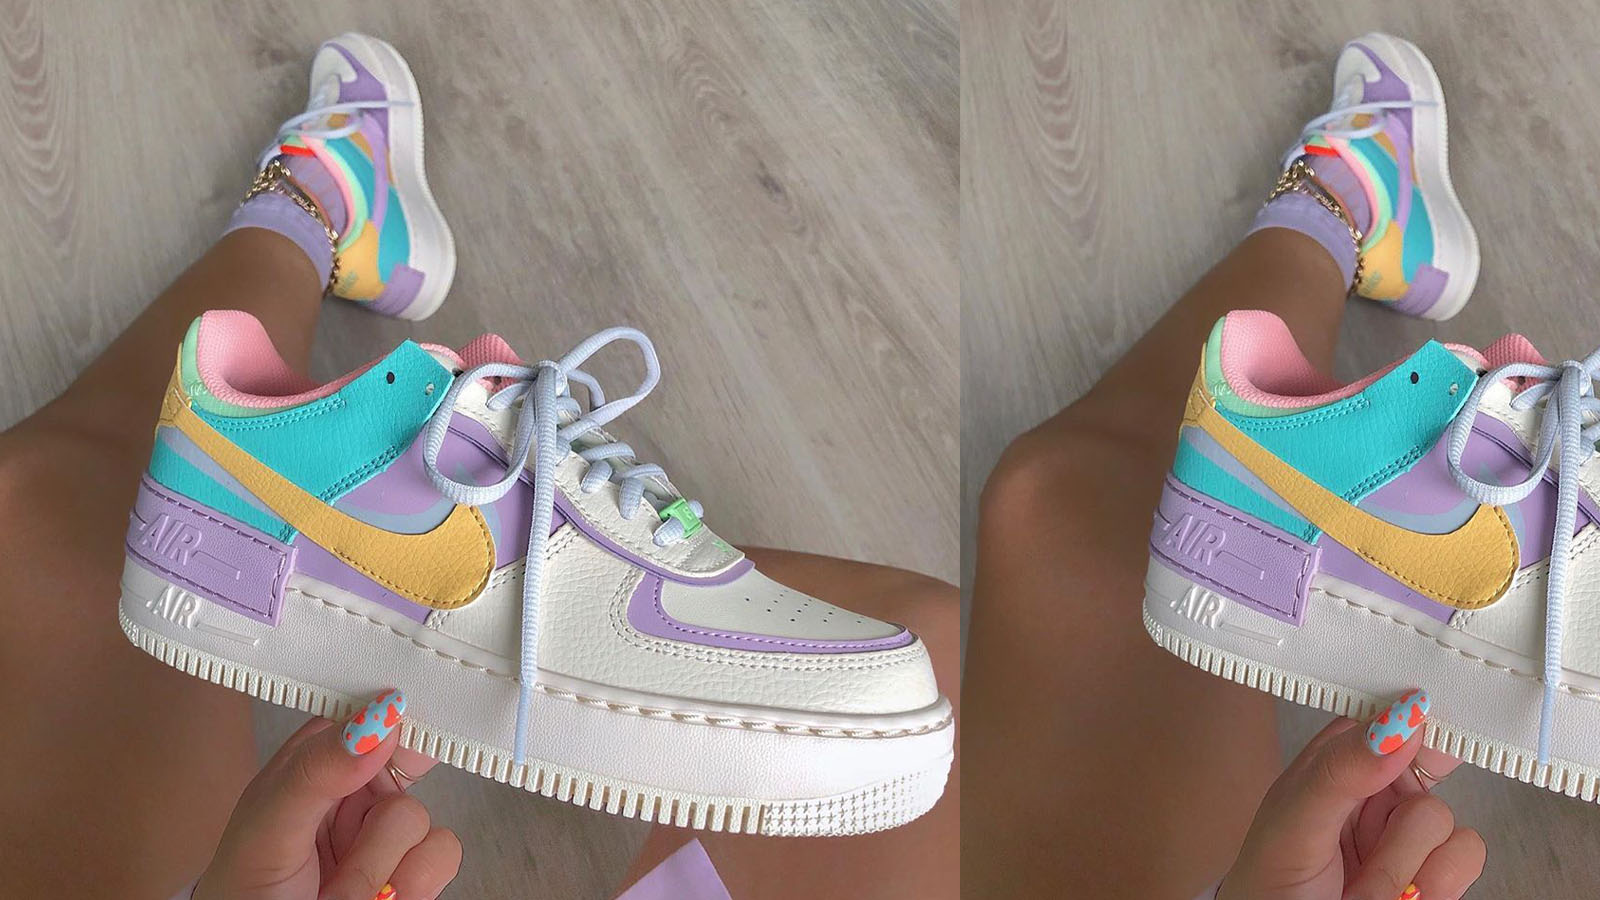 fashion shoe Nike Air VaporMax FlyKnit Gaiter Ispa 2020